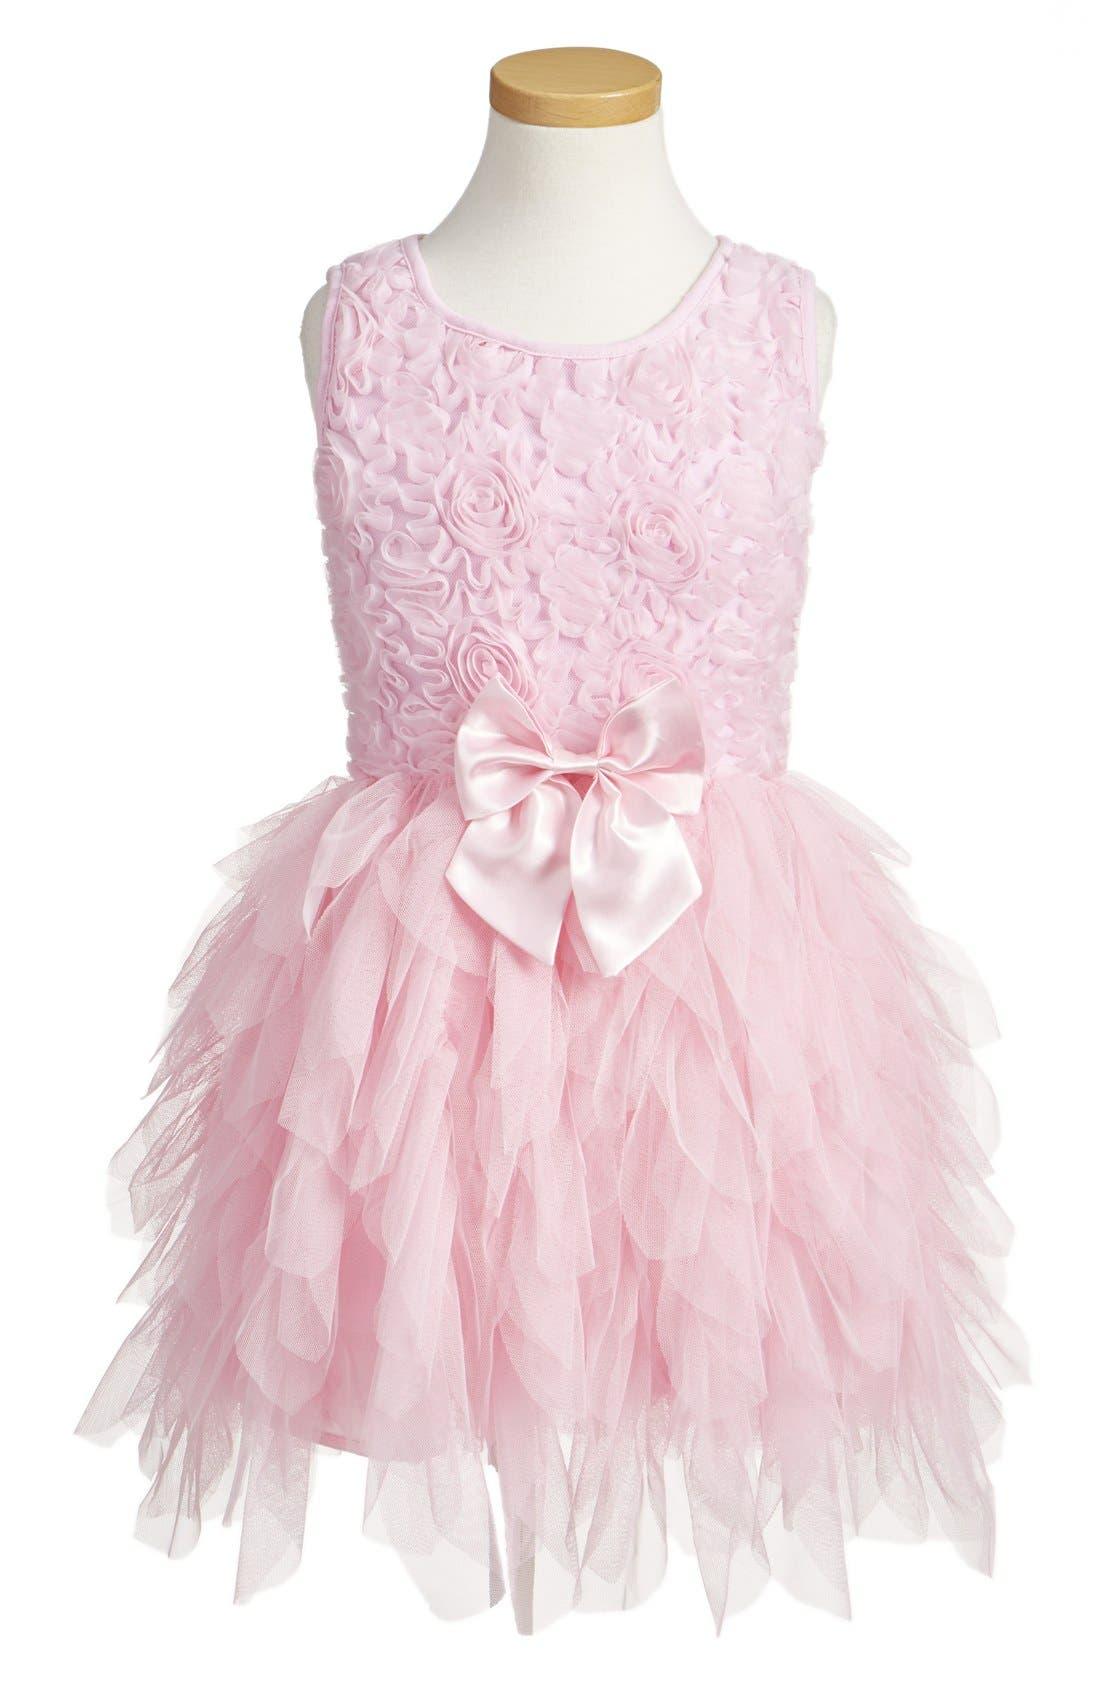 Ribbon Rosette Sleeveless Tulle Dress,                             Main thumbnail 1, color,                             Pink